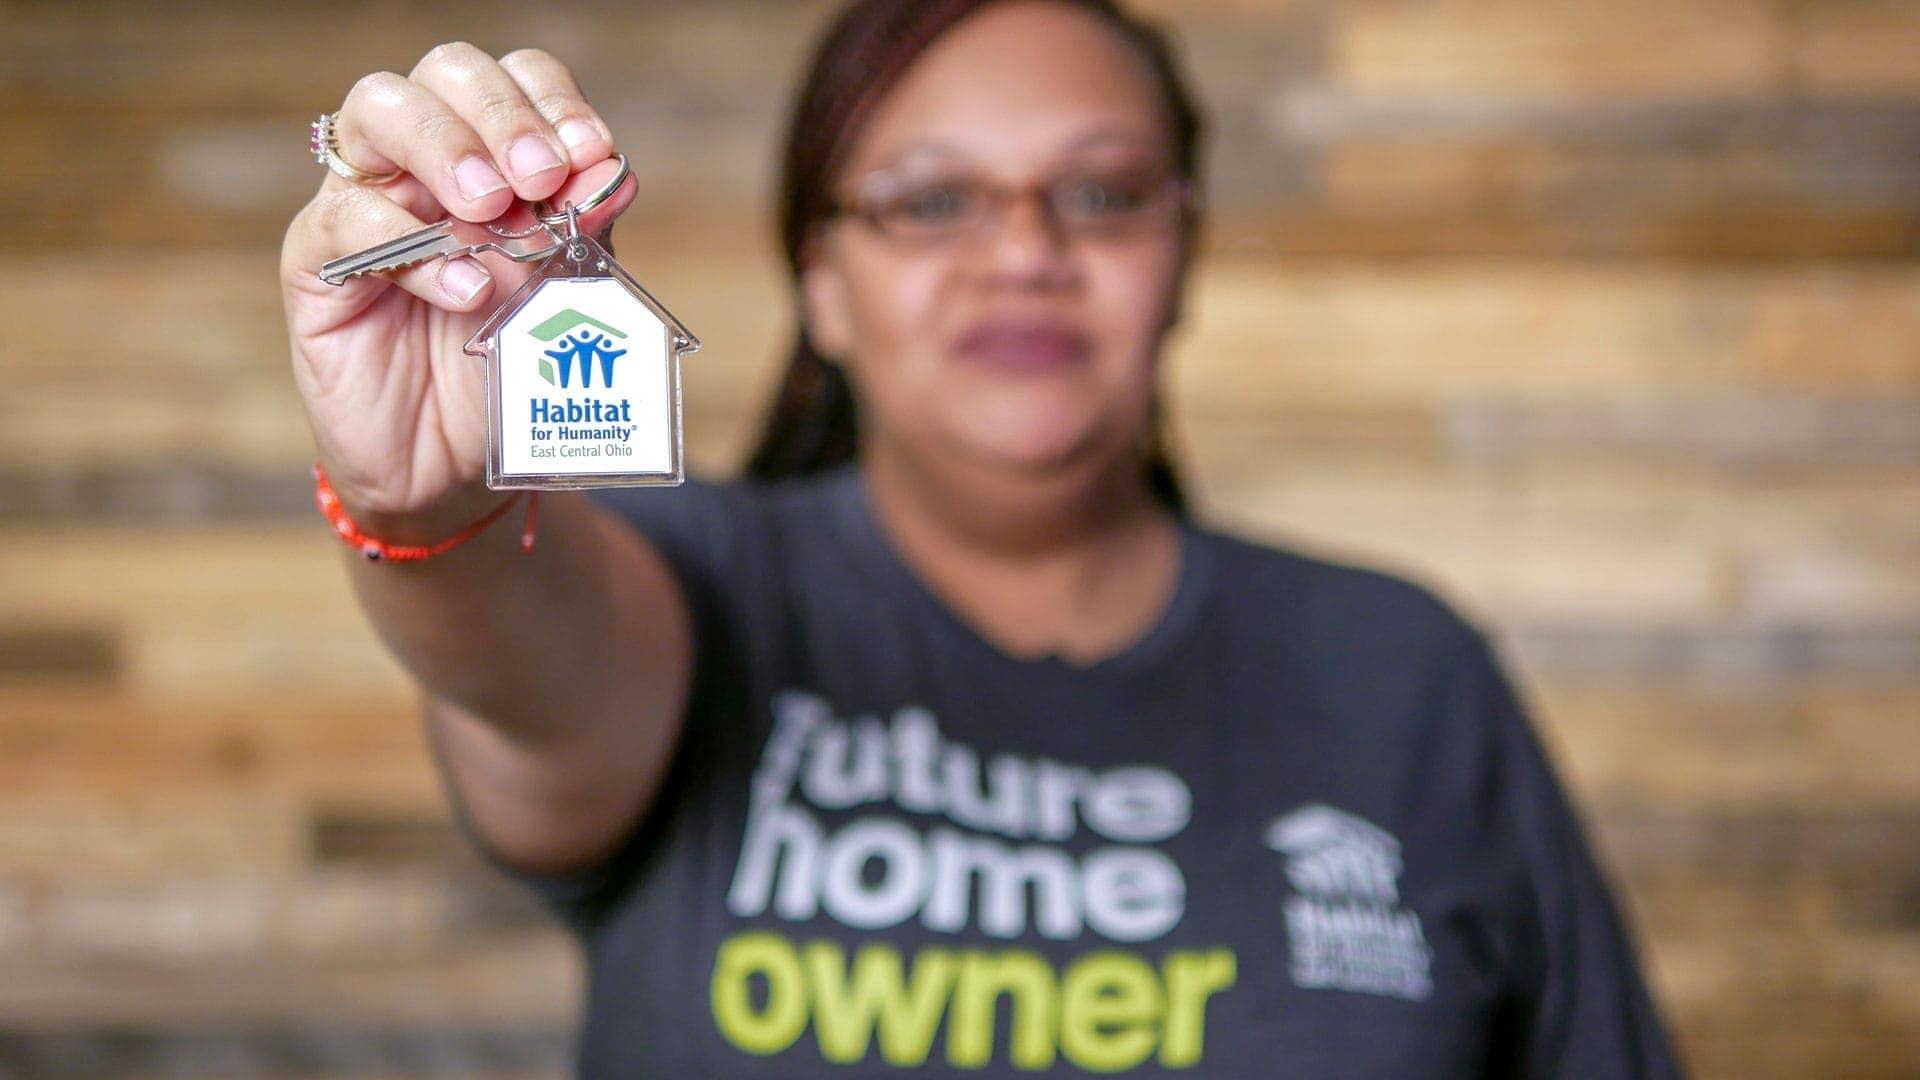 Habitat for Humanity homeowner holding keys to home.